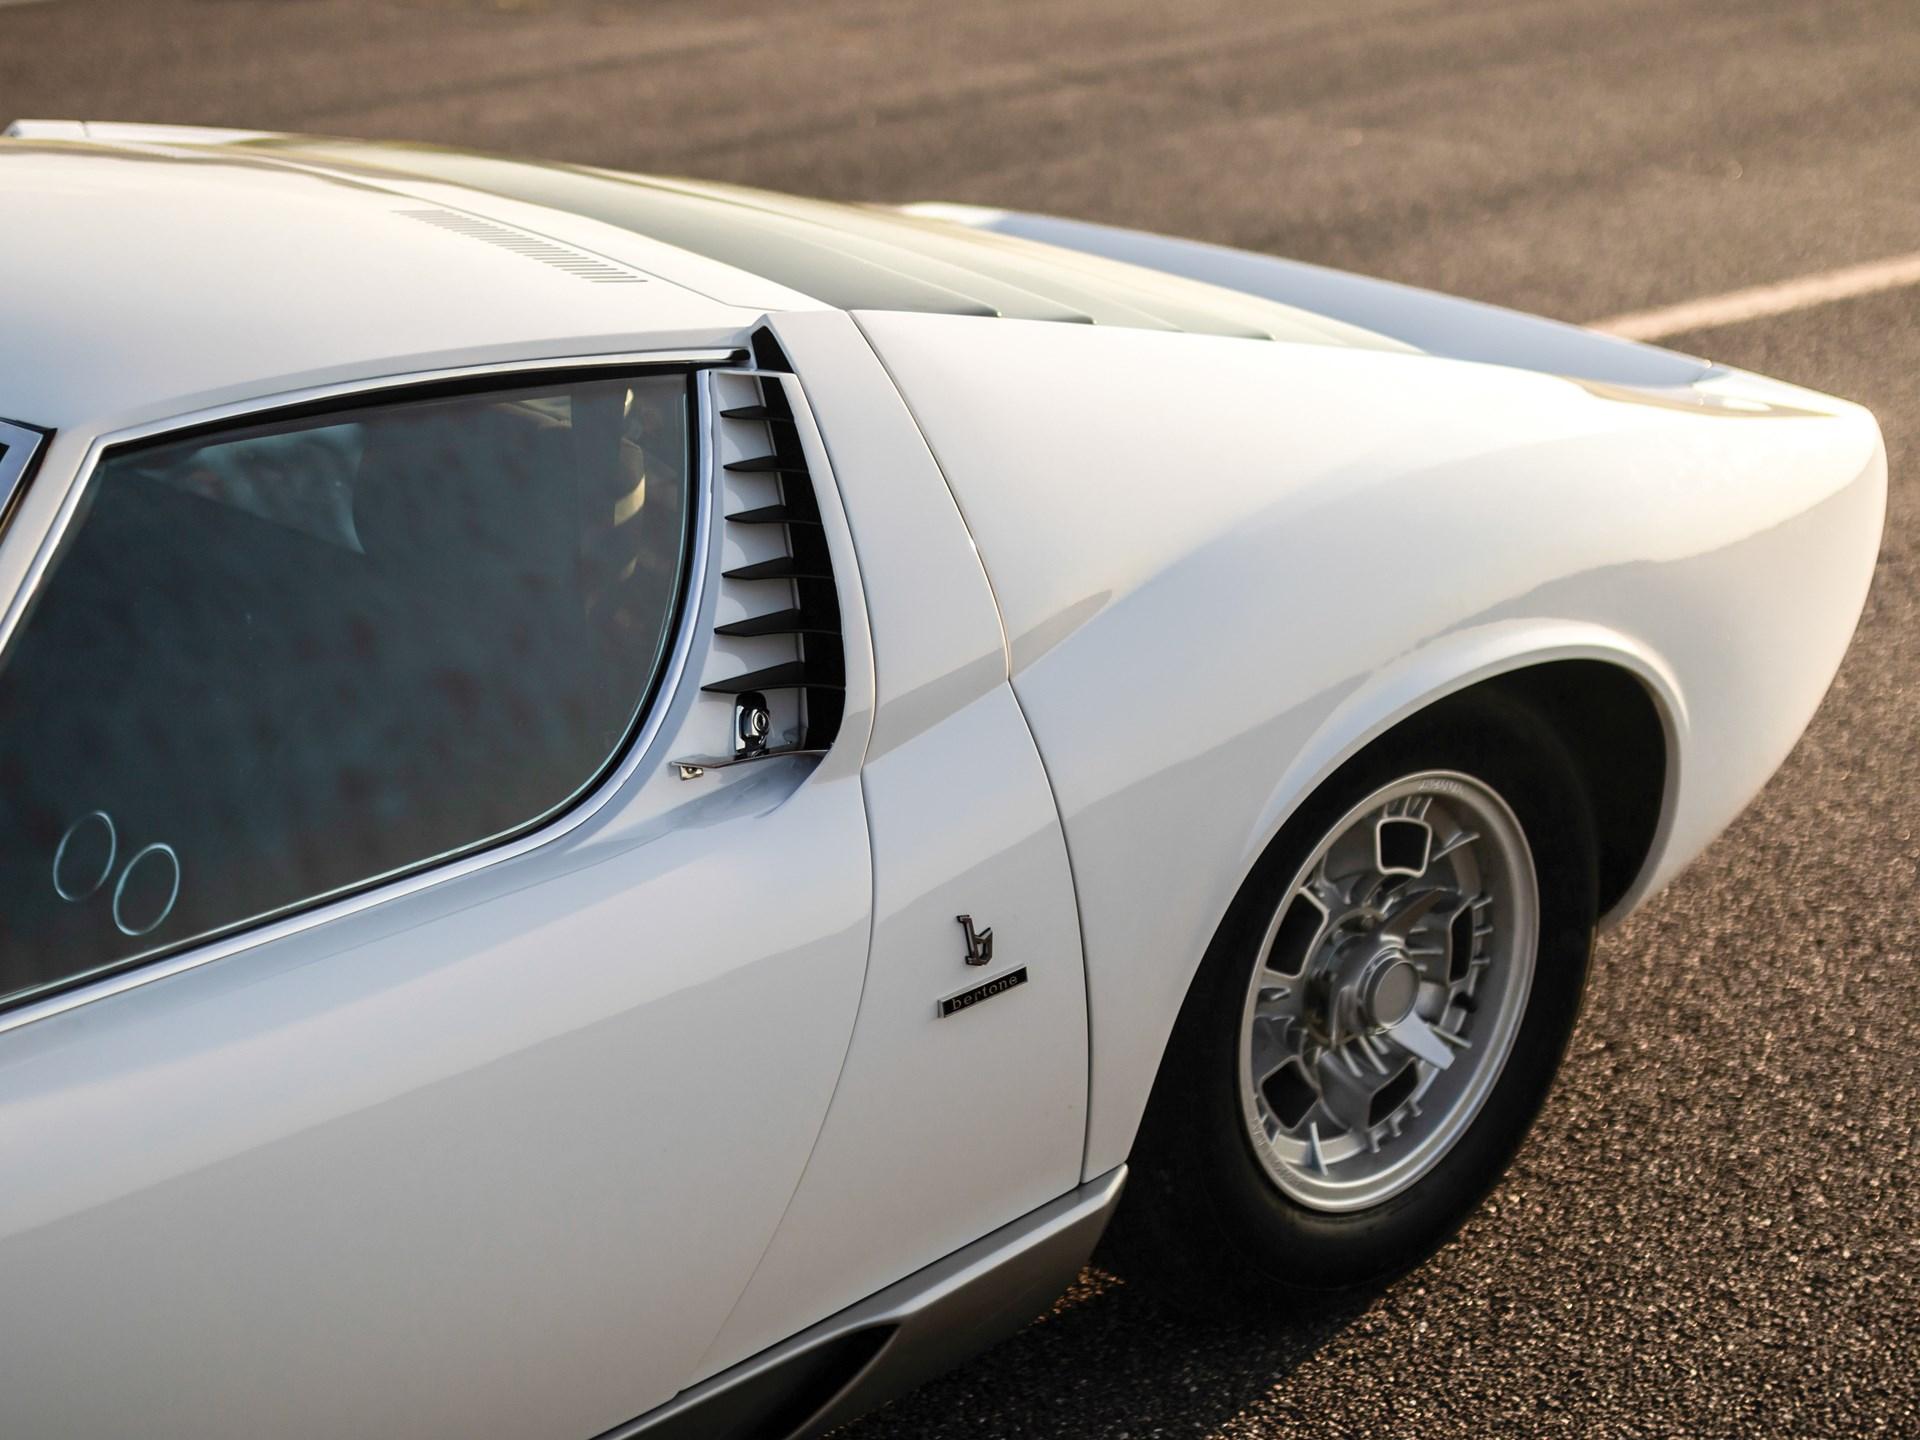 Rm Sotheby S 1971 Lamborghini Miura P400 S By Bertone London 2018